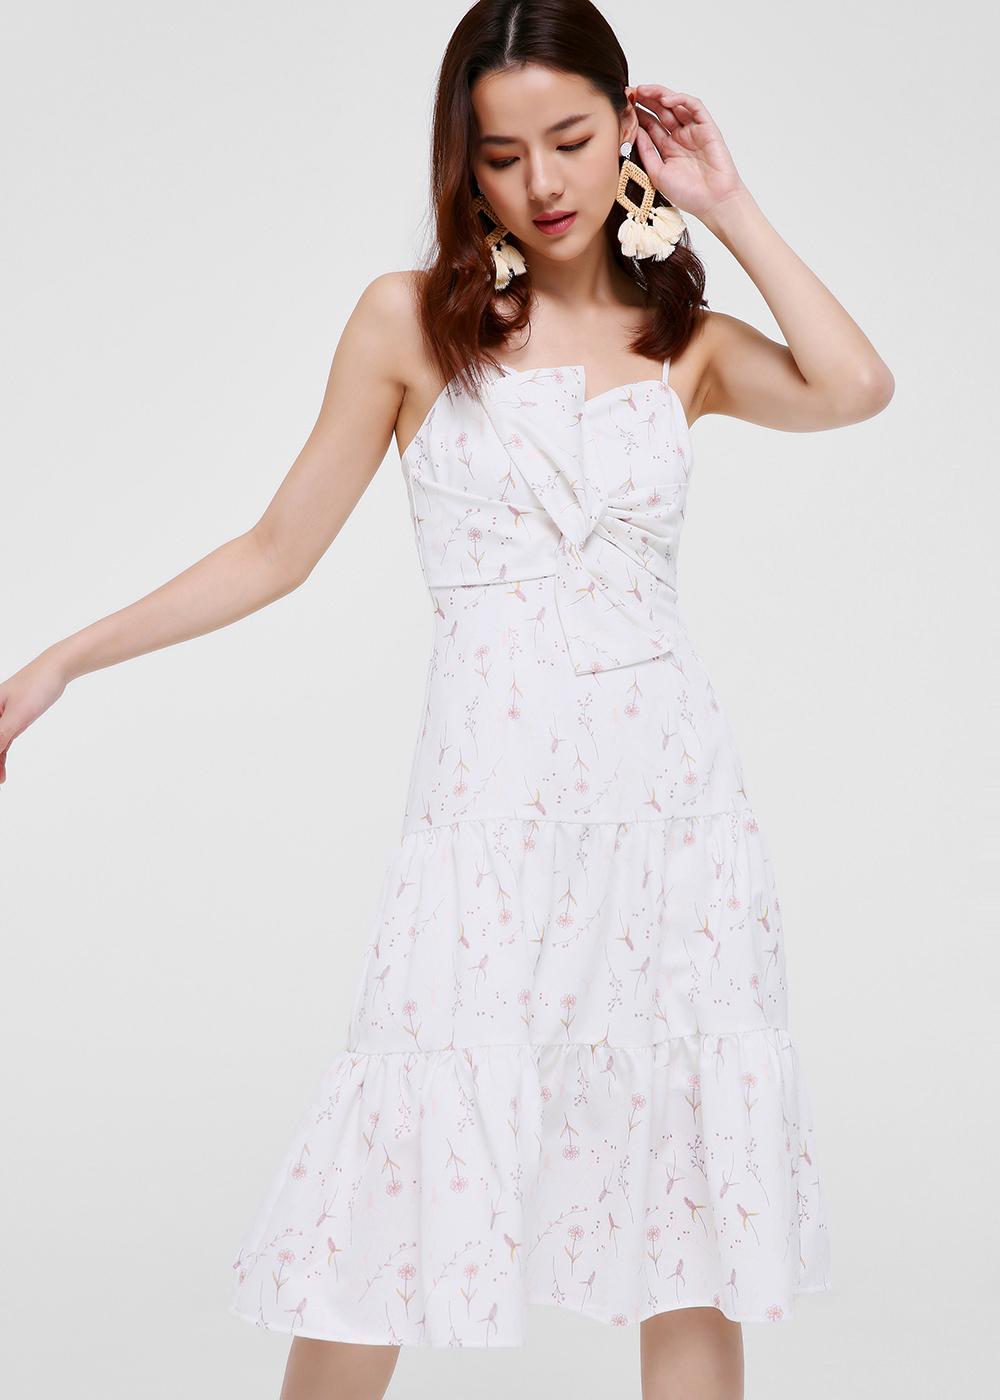 Angeline Printed Tiered Midi Dress